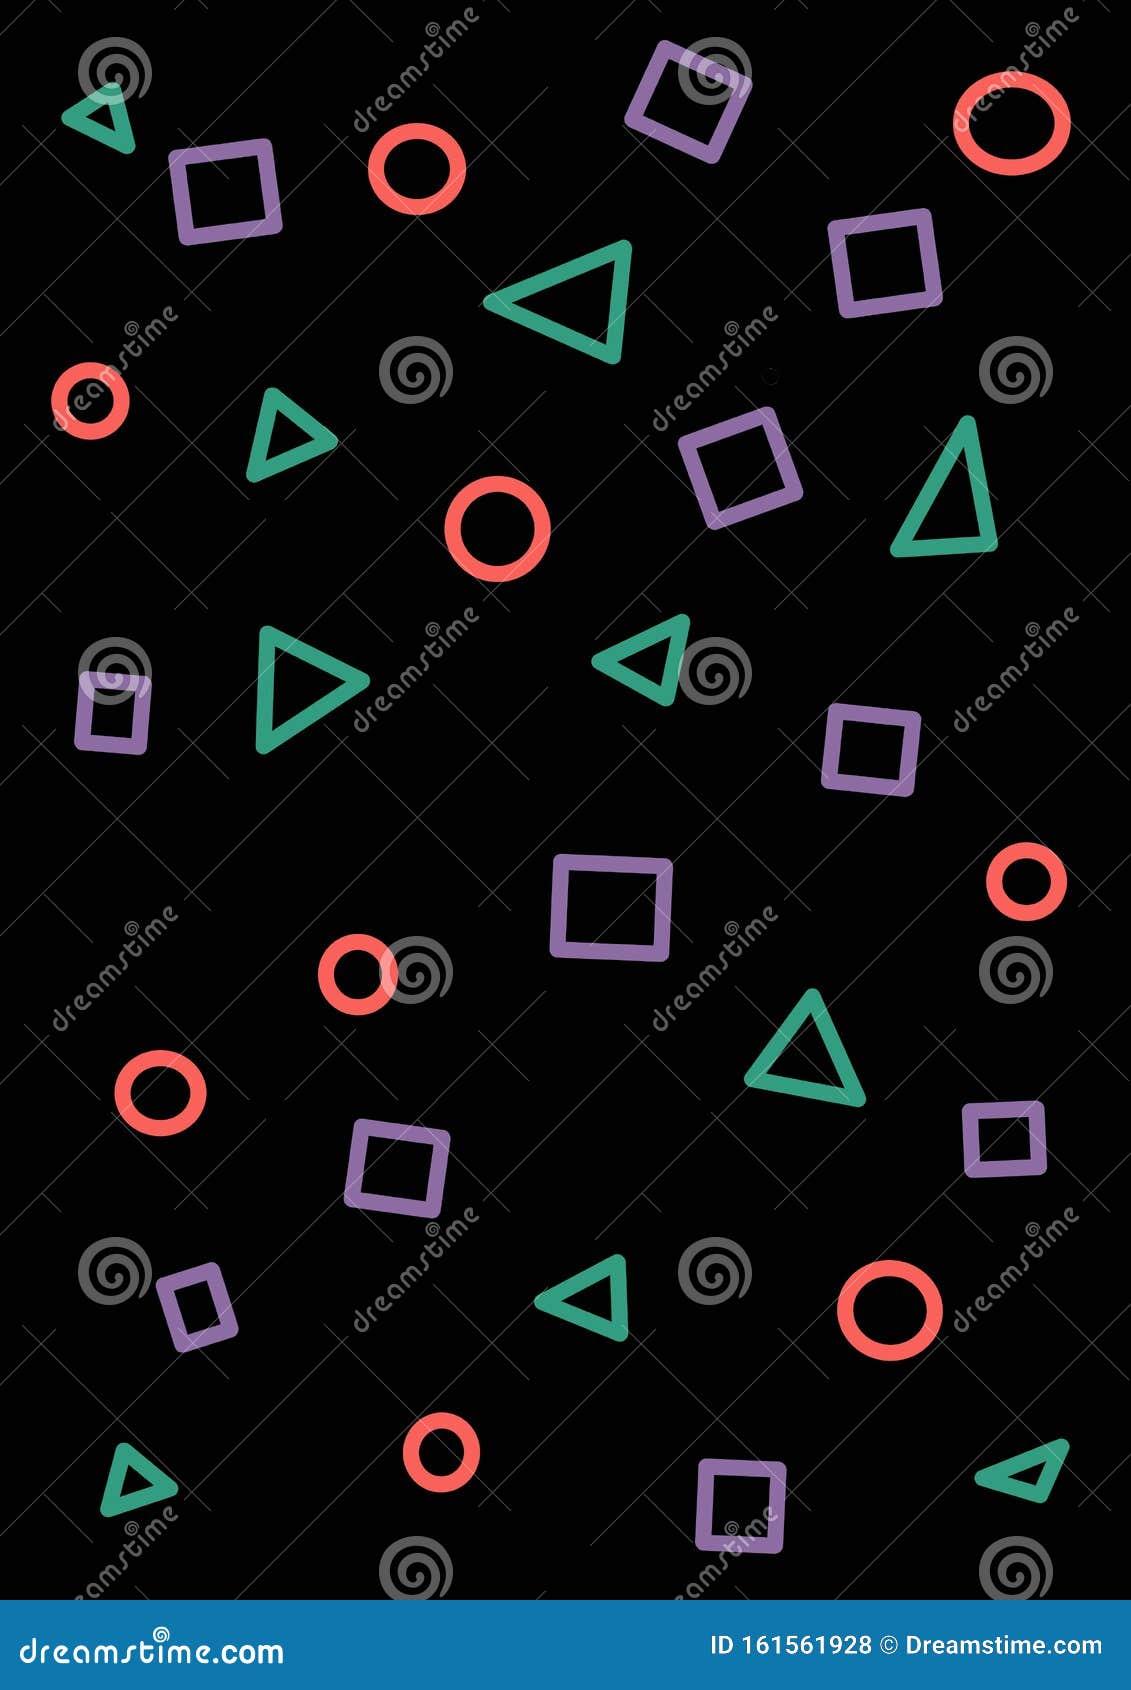 game playstation seamless pattern multi color geometric shapes contours dark background fashion s retro vin vintage 161561928